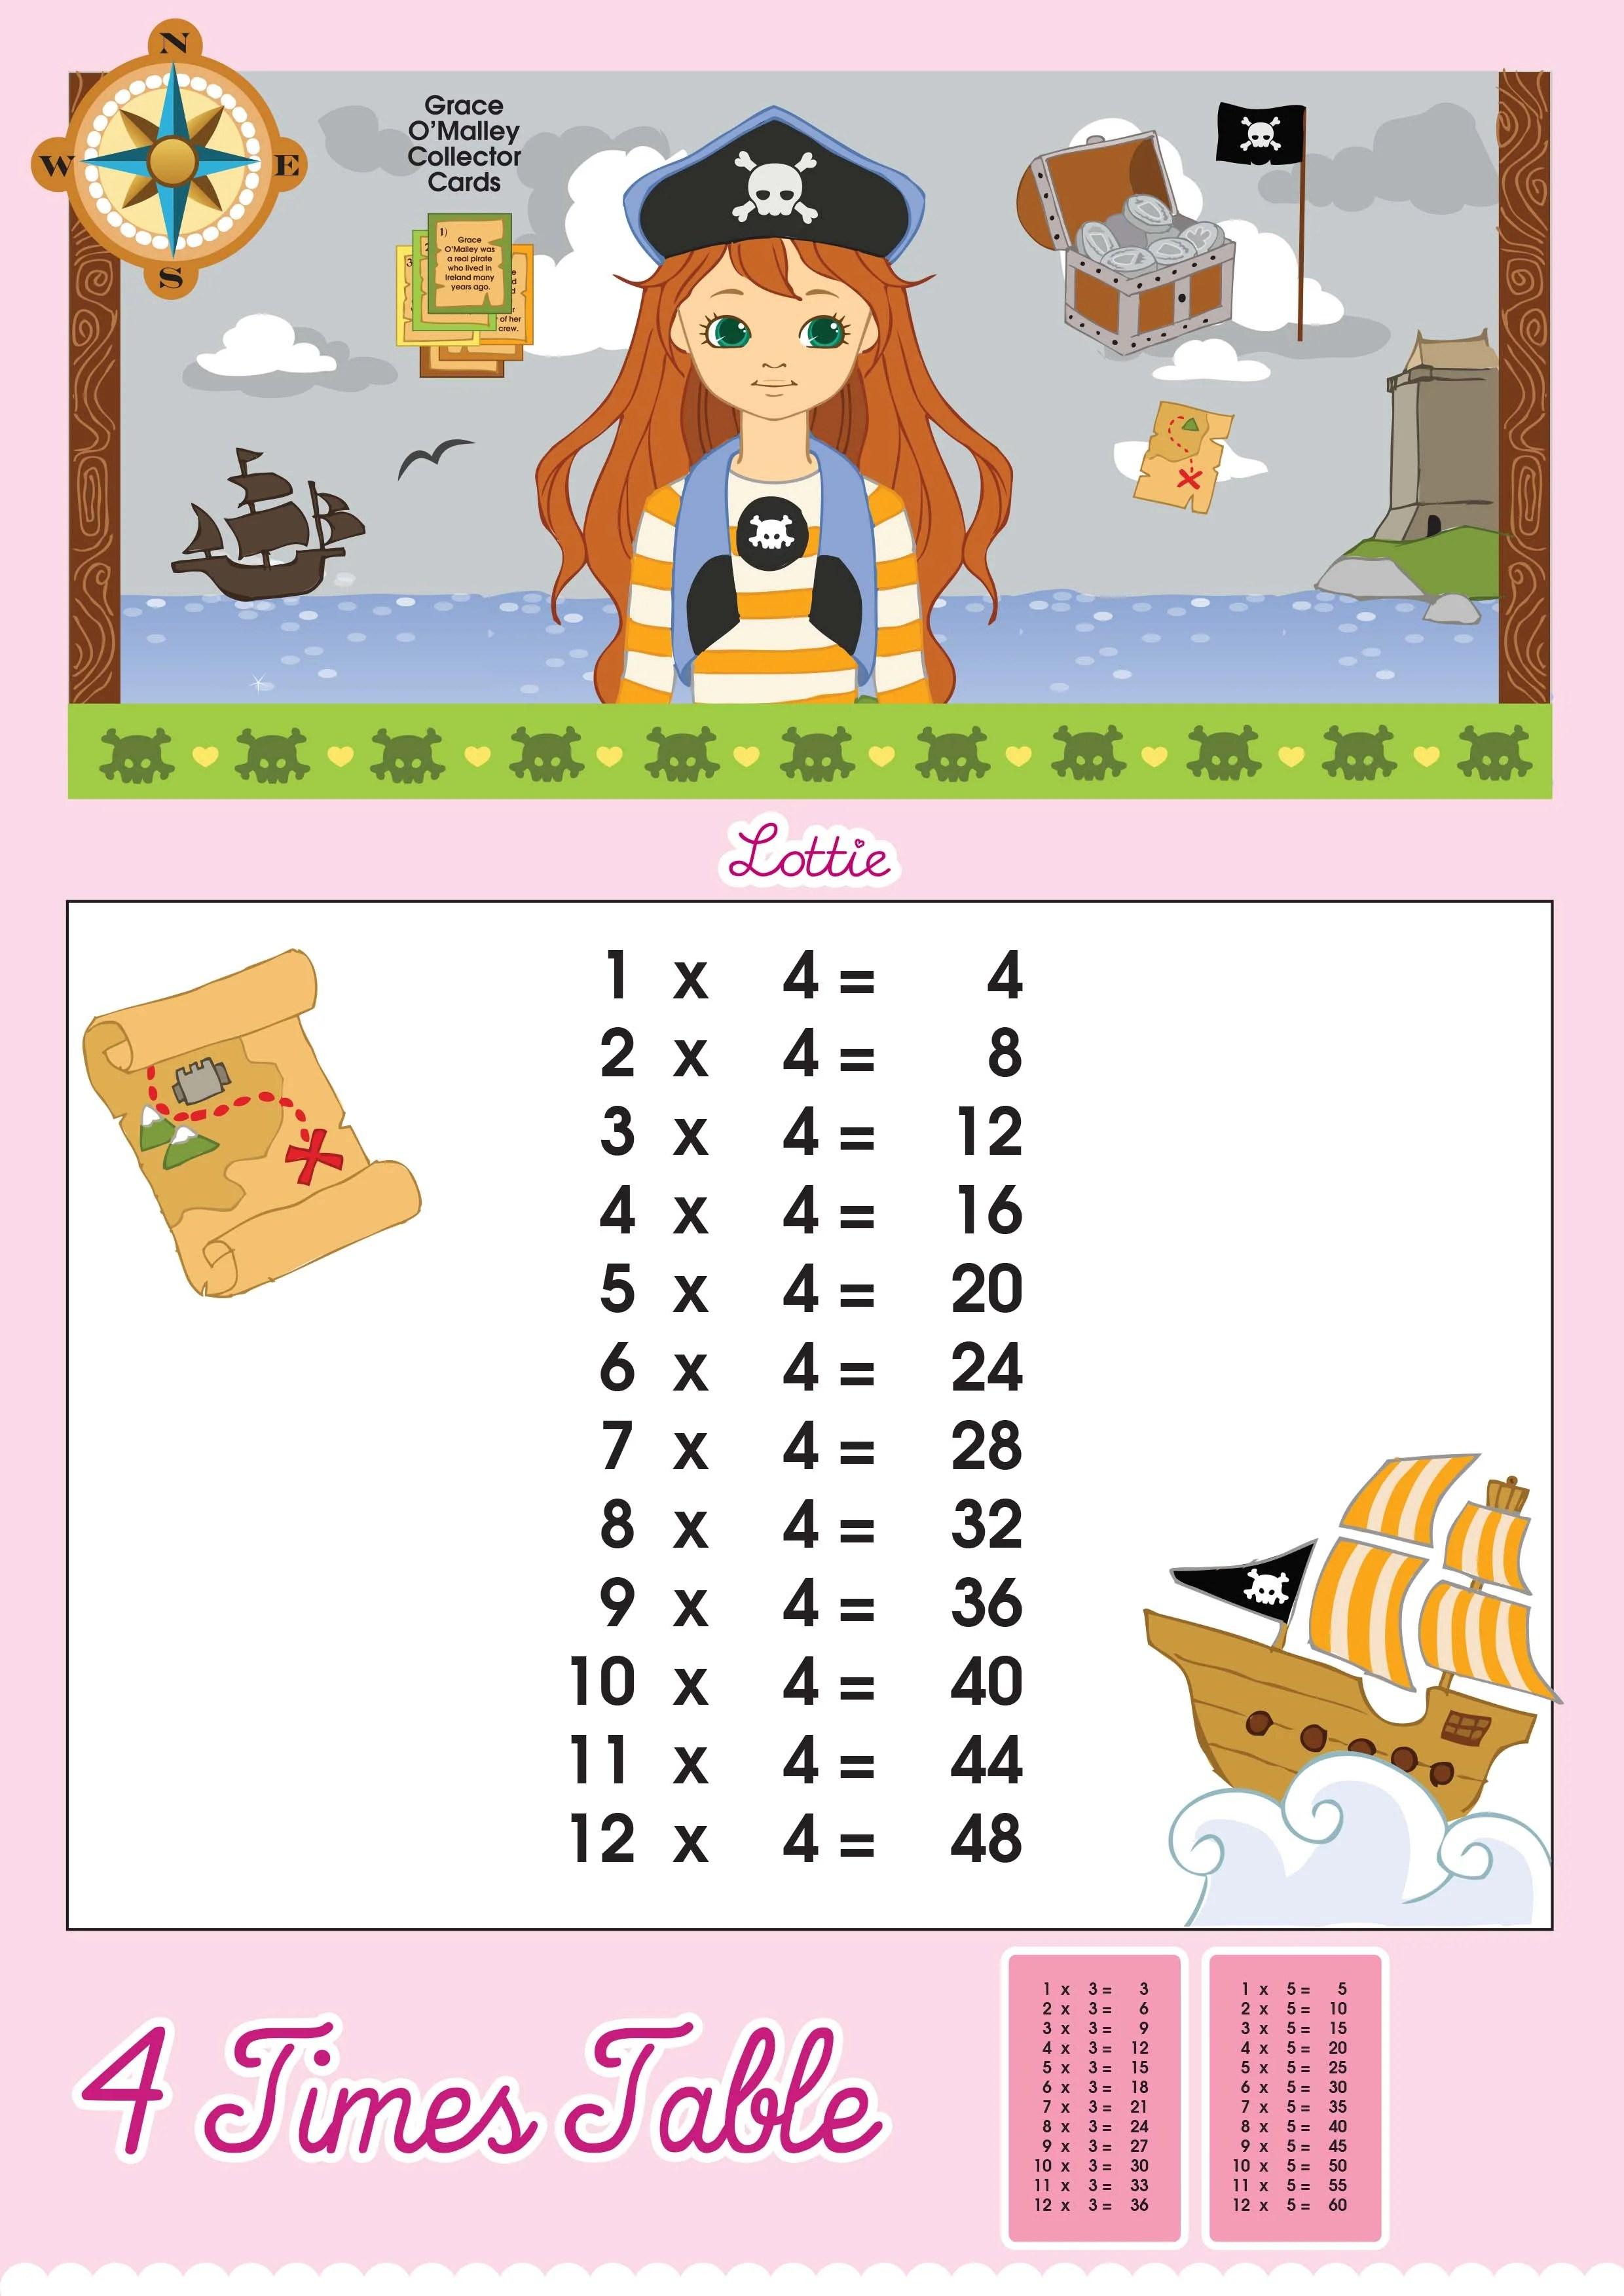 4 Times Table Multiplication Chart Lottie Dolls